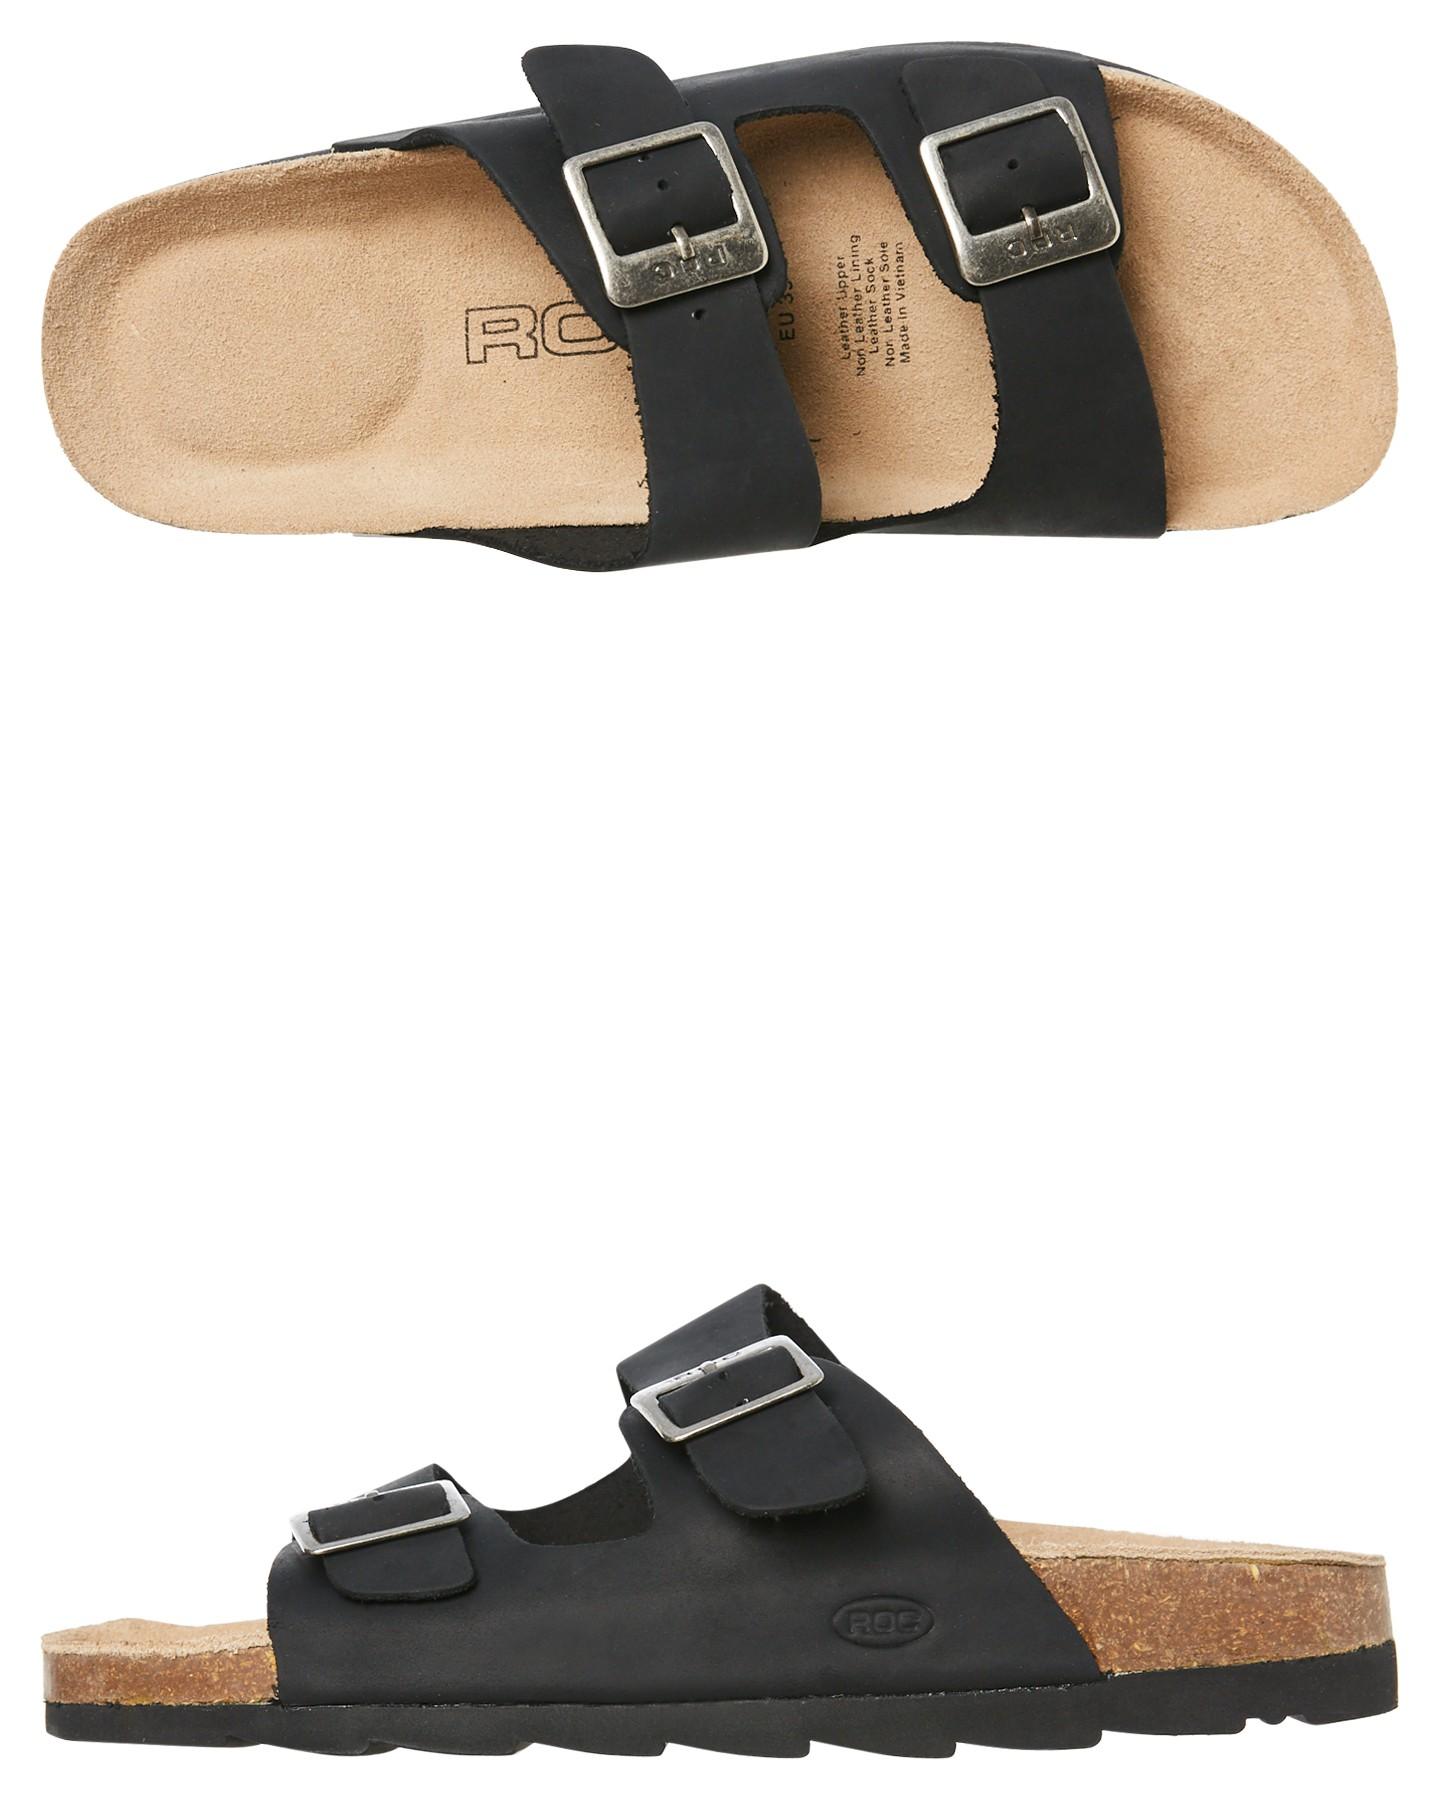 c142db4c937 Black Coloured Womens Bermuda Sandal Black By ROC BOOTS AUSTRALIA |  ShoeSales